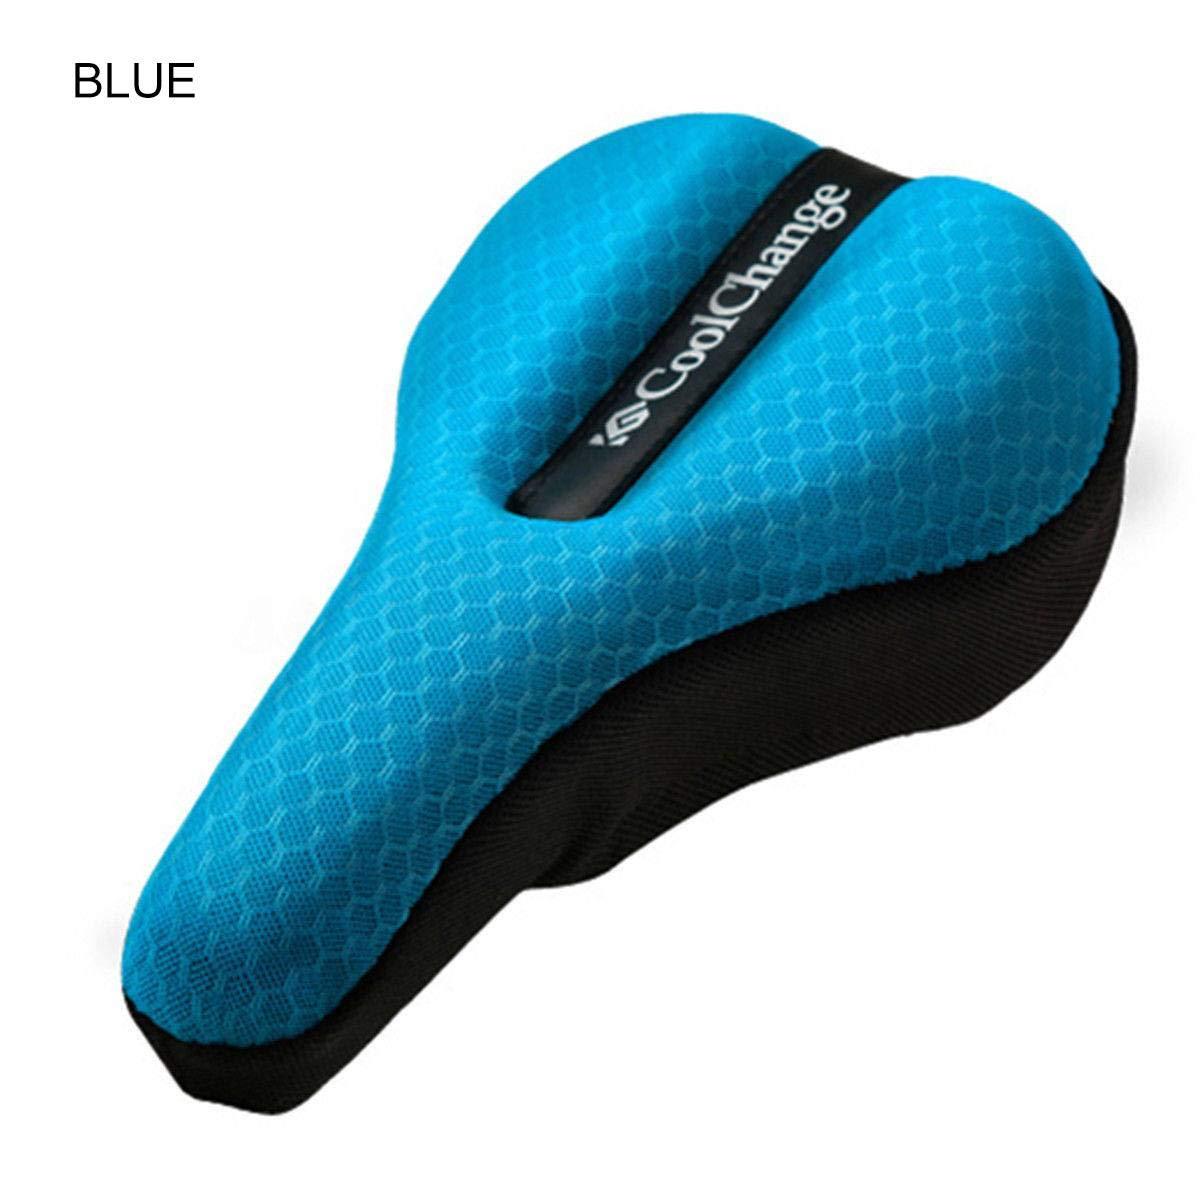 vivpro Silicone Gel Extra Soft Bicycle Bike MTB Saddle Cushion Seat Cover Pad Comfort by vivpro (Image #3)